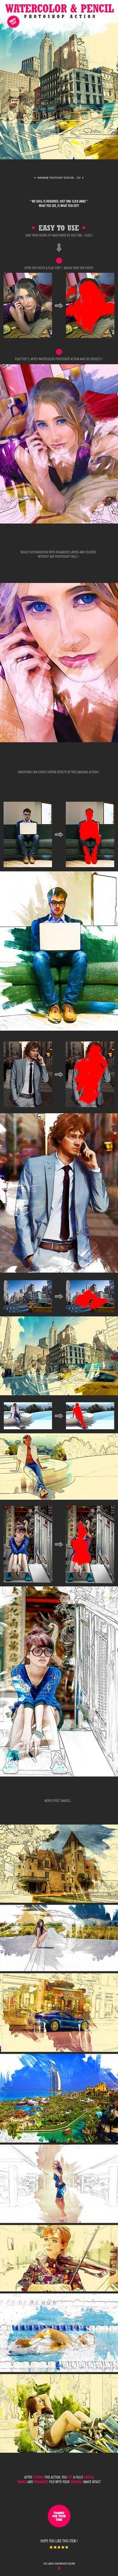 Watercolor & Pencil Photoshop Action #photoeffect Download: http://graphicriver.net/item/watercolor-pencil-photoshop-action/14169783?ref=ksioks